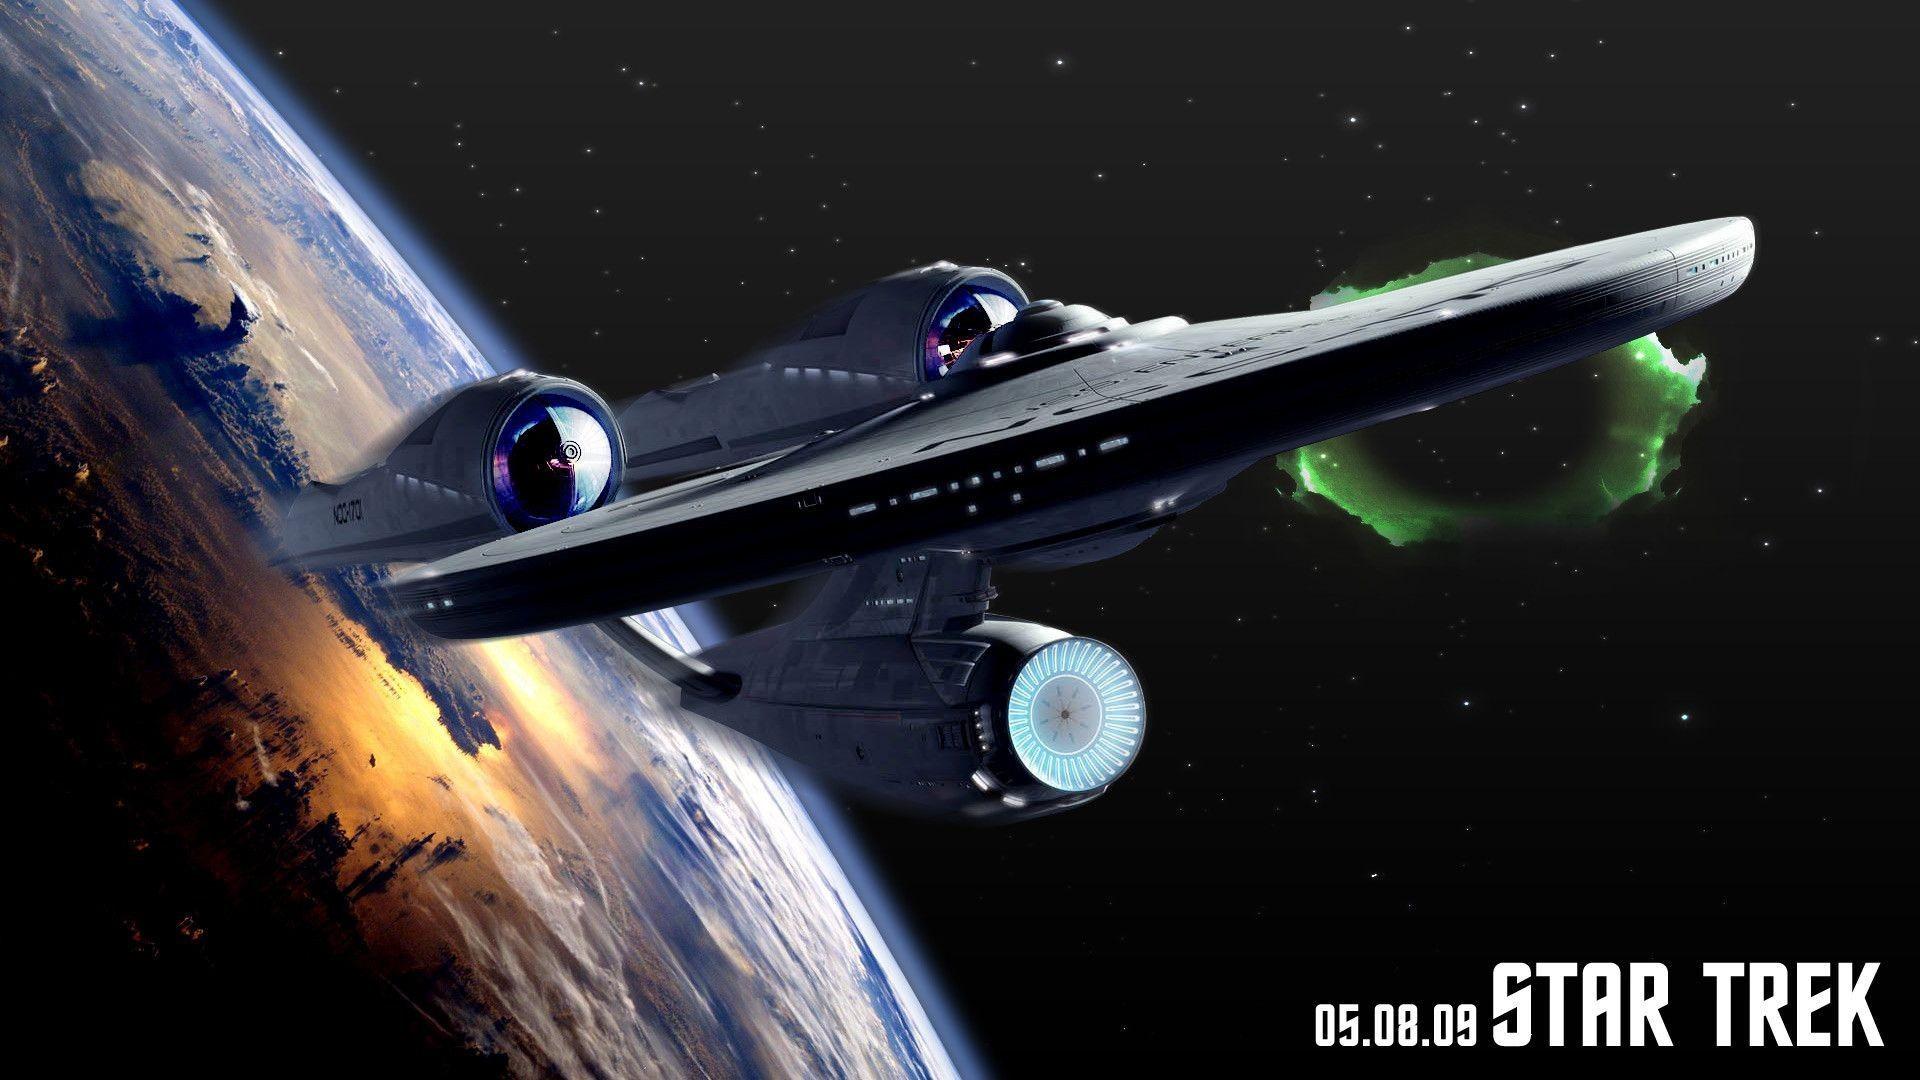 Star Trek Starship Enterpise Evolution in Photos Spacecom